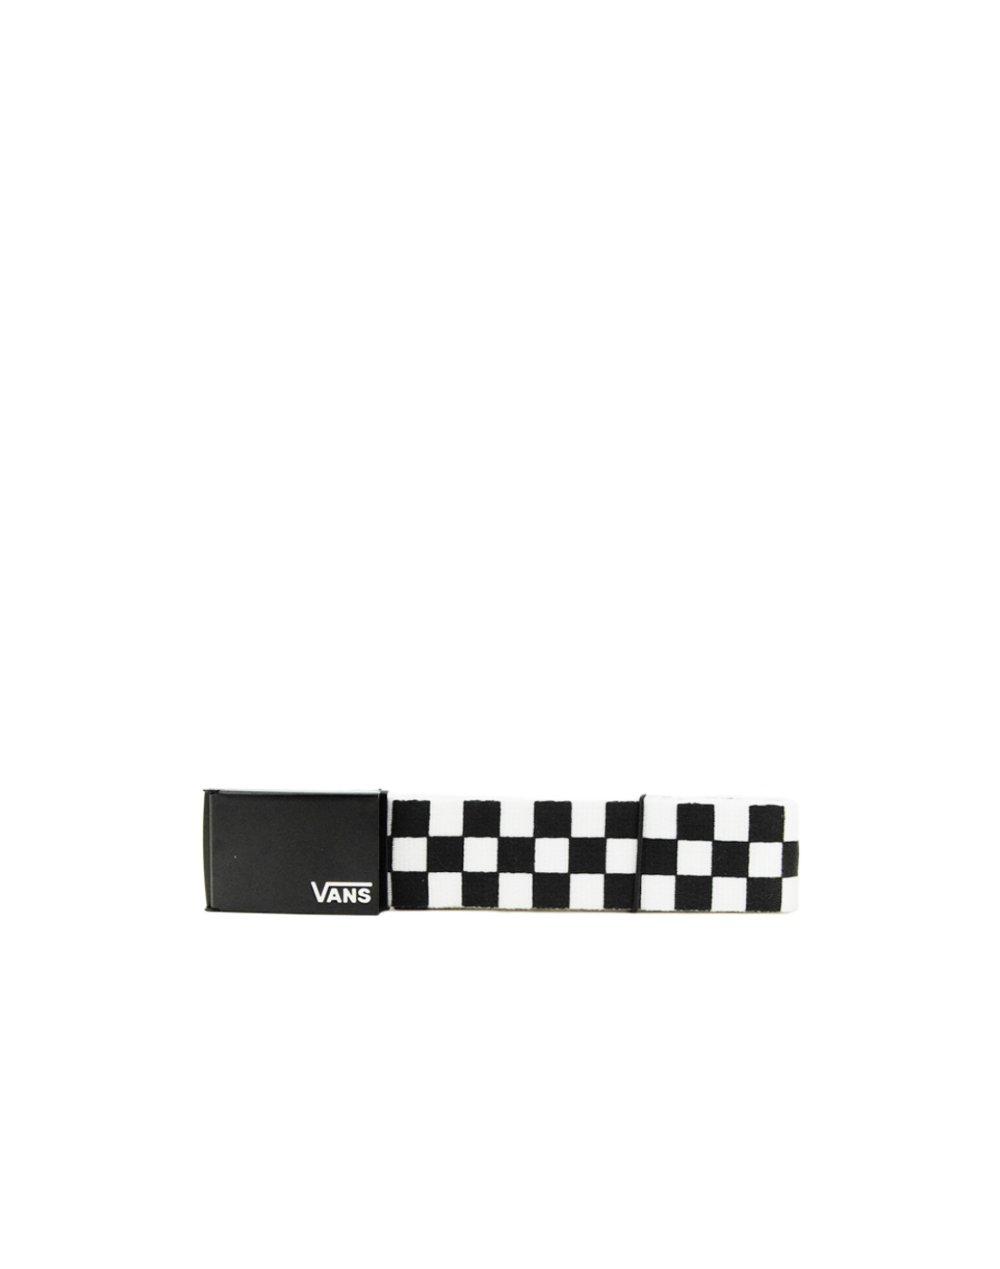 Vans Deppster II Web Belt (VN0A31J1Y281) Checkerboard